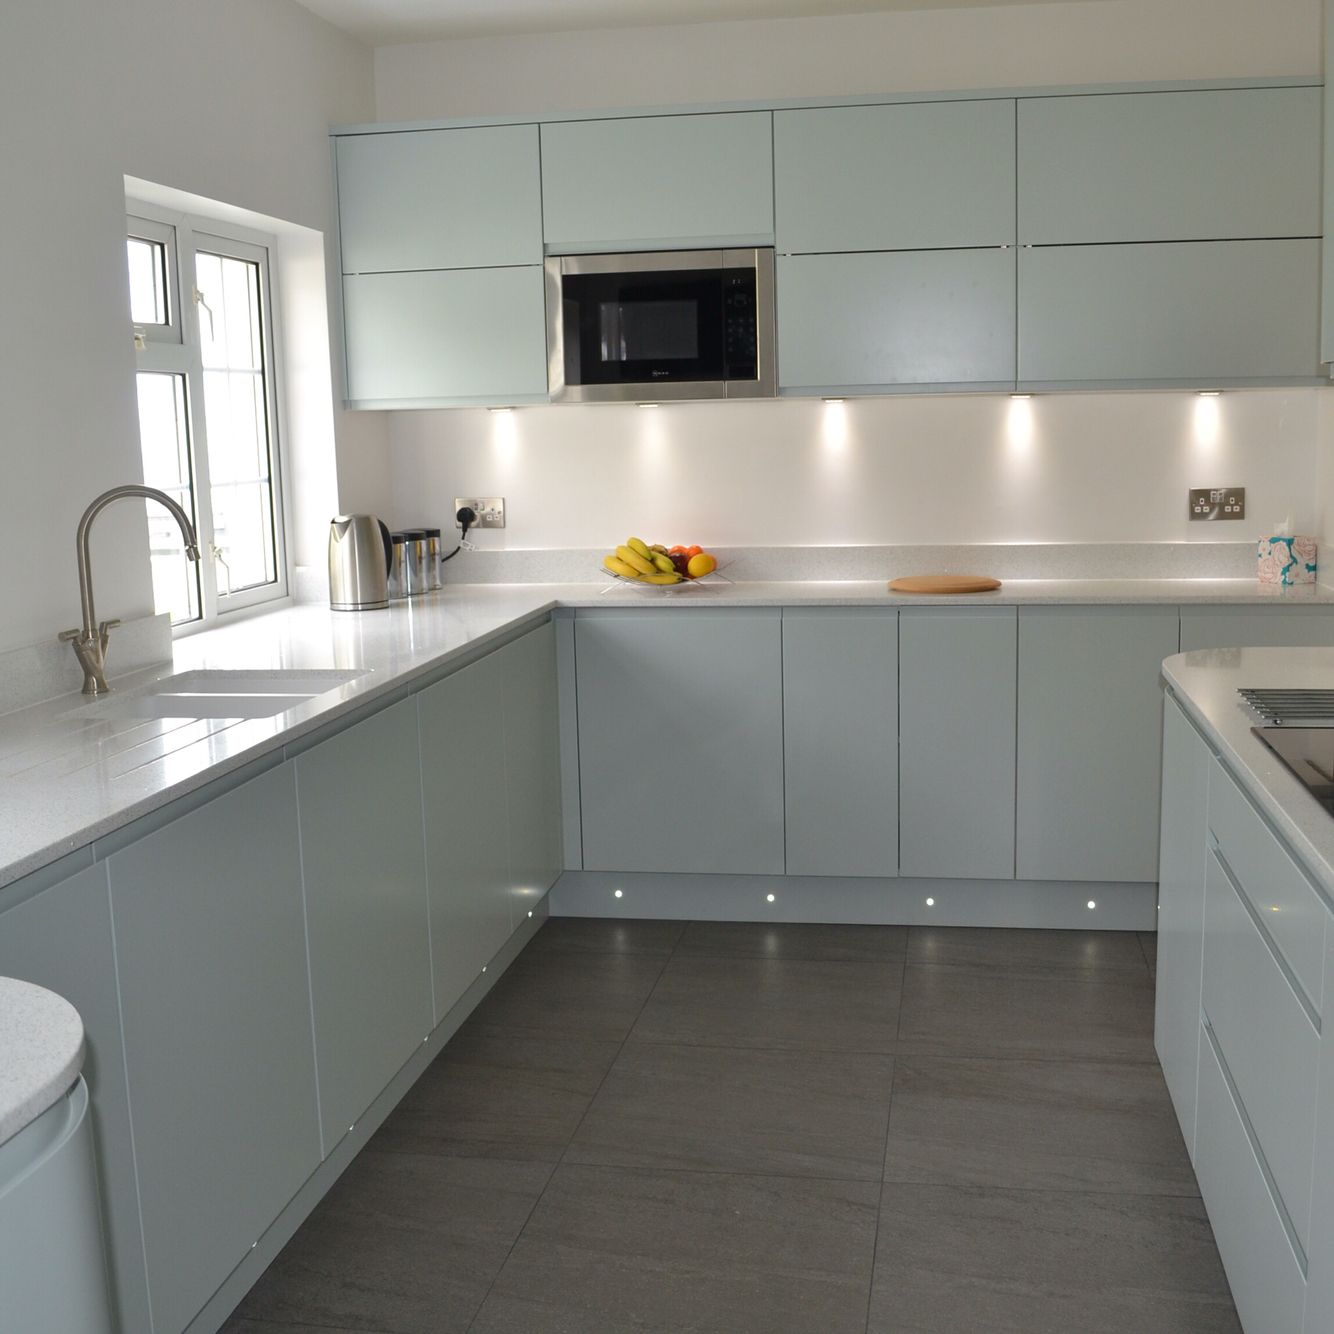 Grey slate floor tiles compliment the sleek lines of the kitchen grey slate floor tiles compliment the sleek lines of the kitchen dailygadgetfo Images